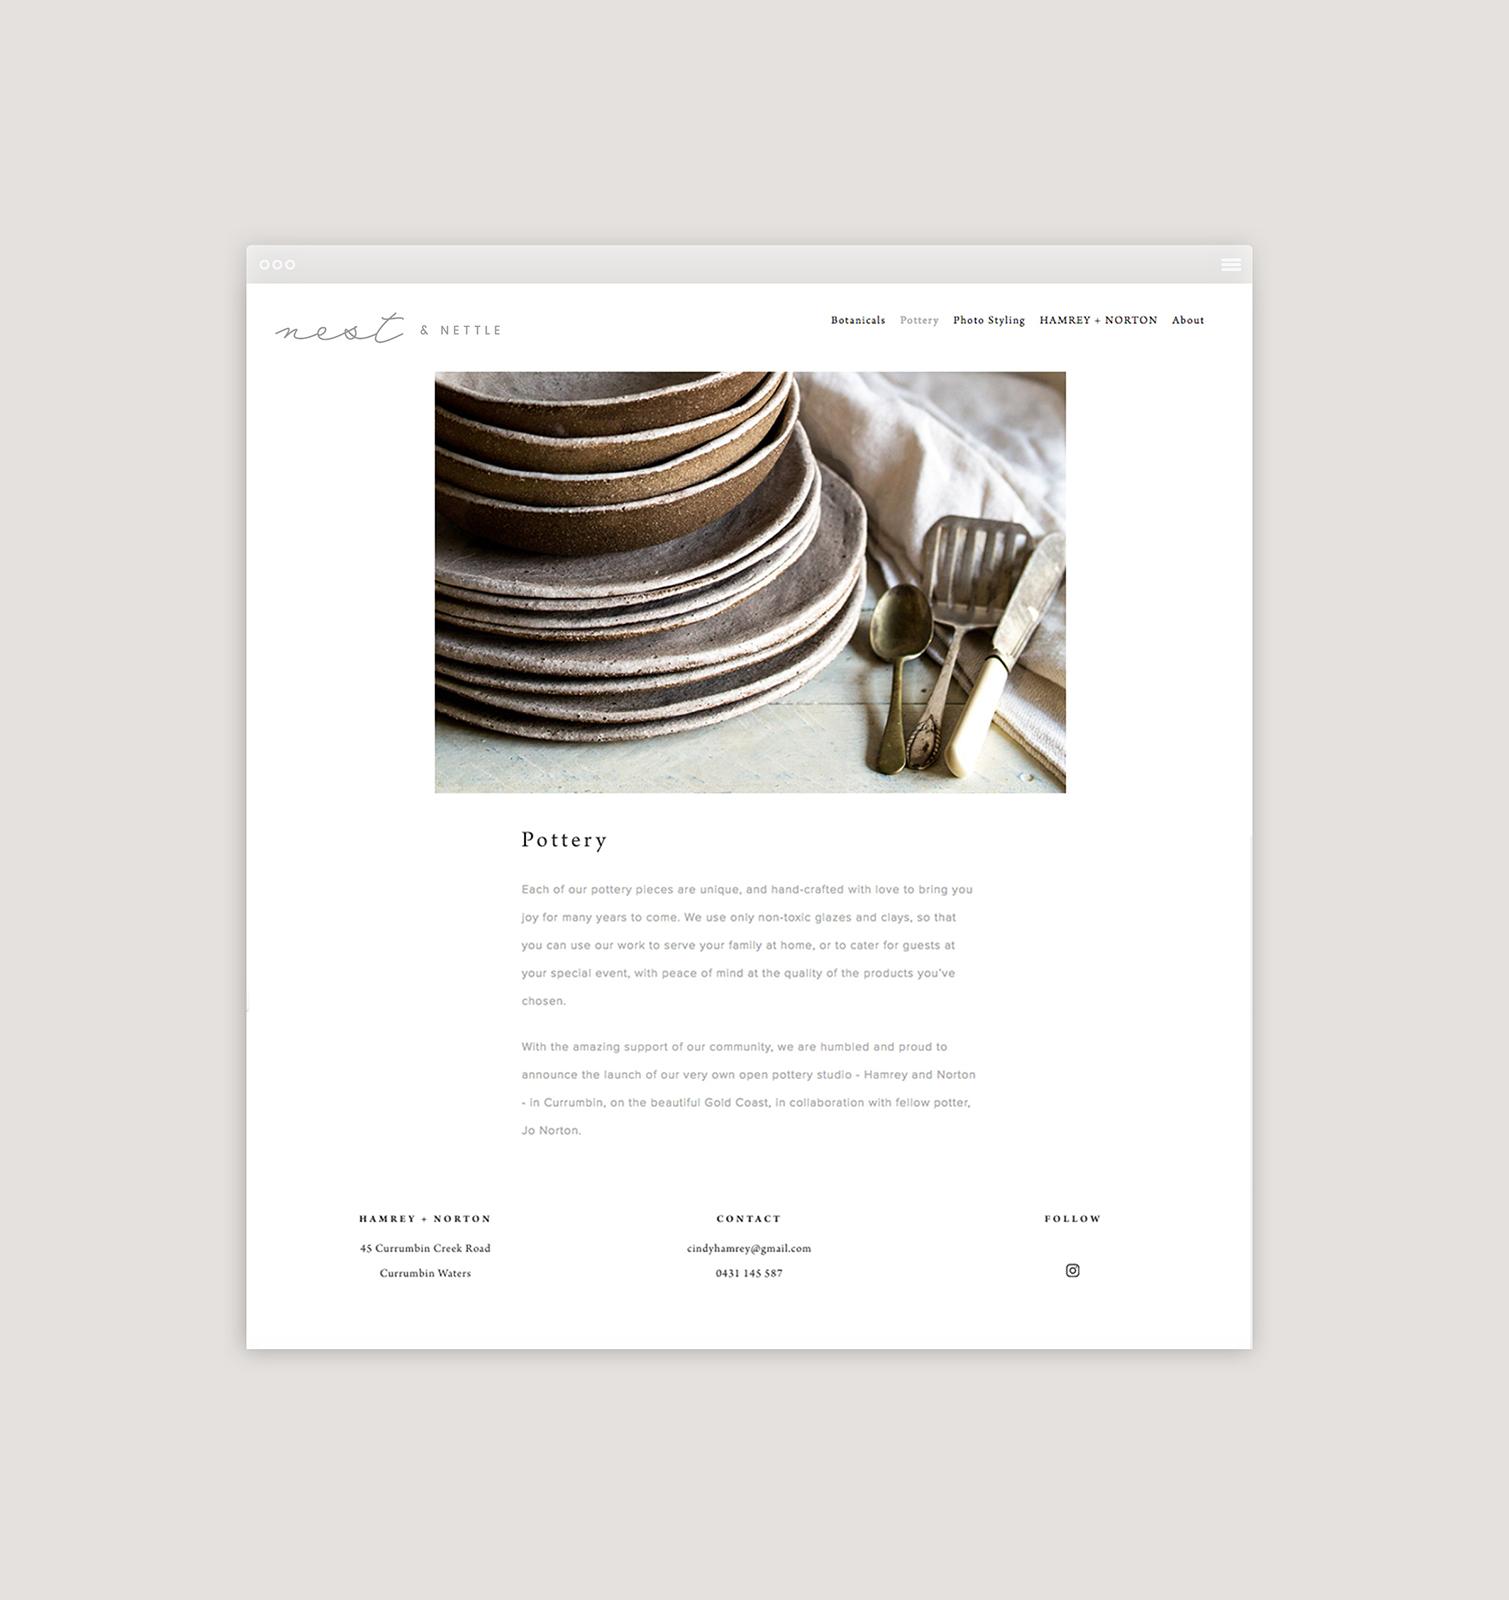 00_NestandNettle_Ceramics_Website_by_Foster_Creative.jpg